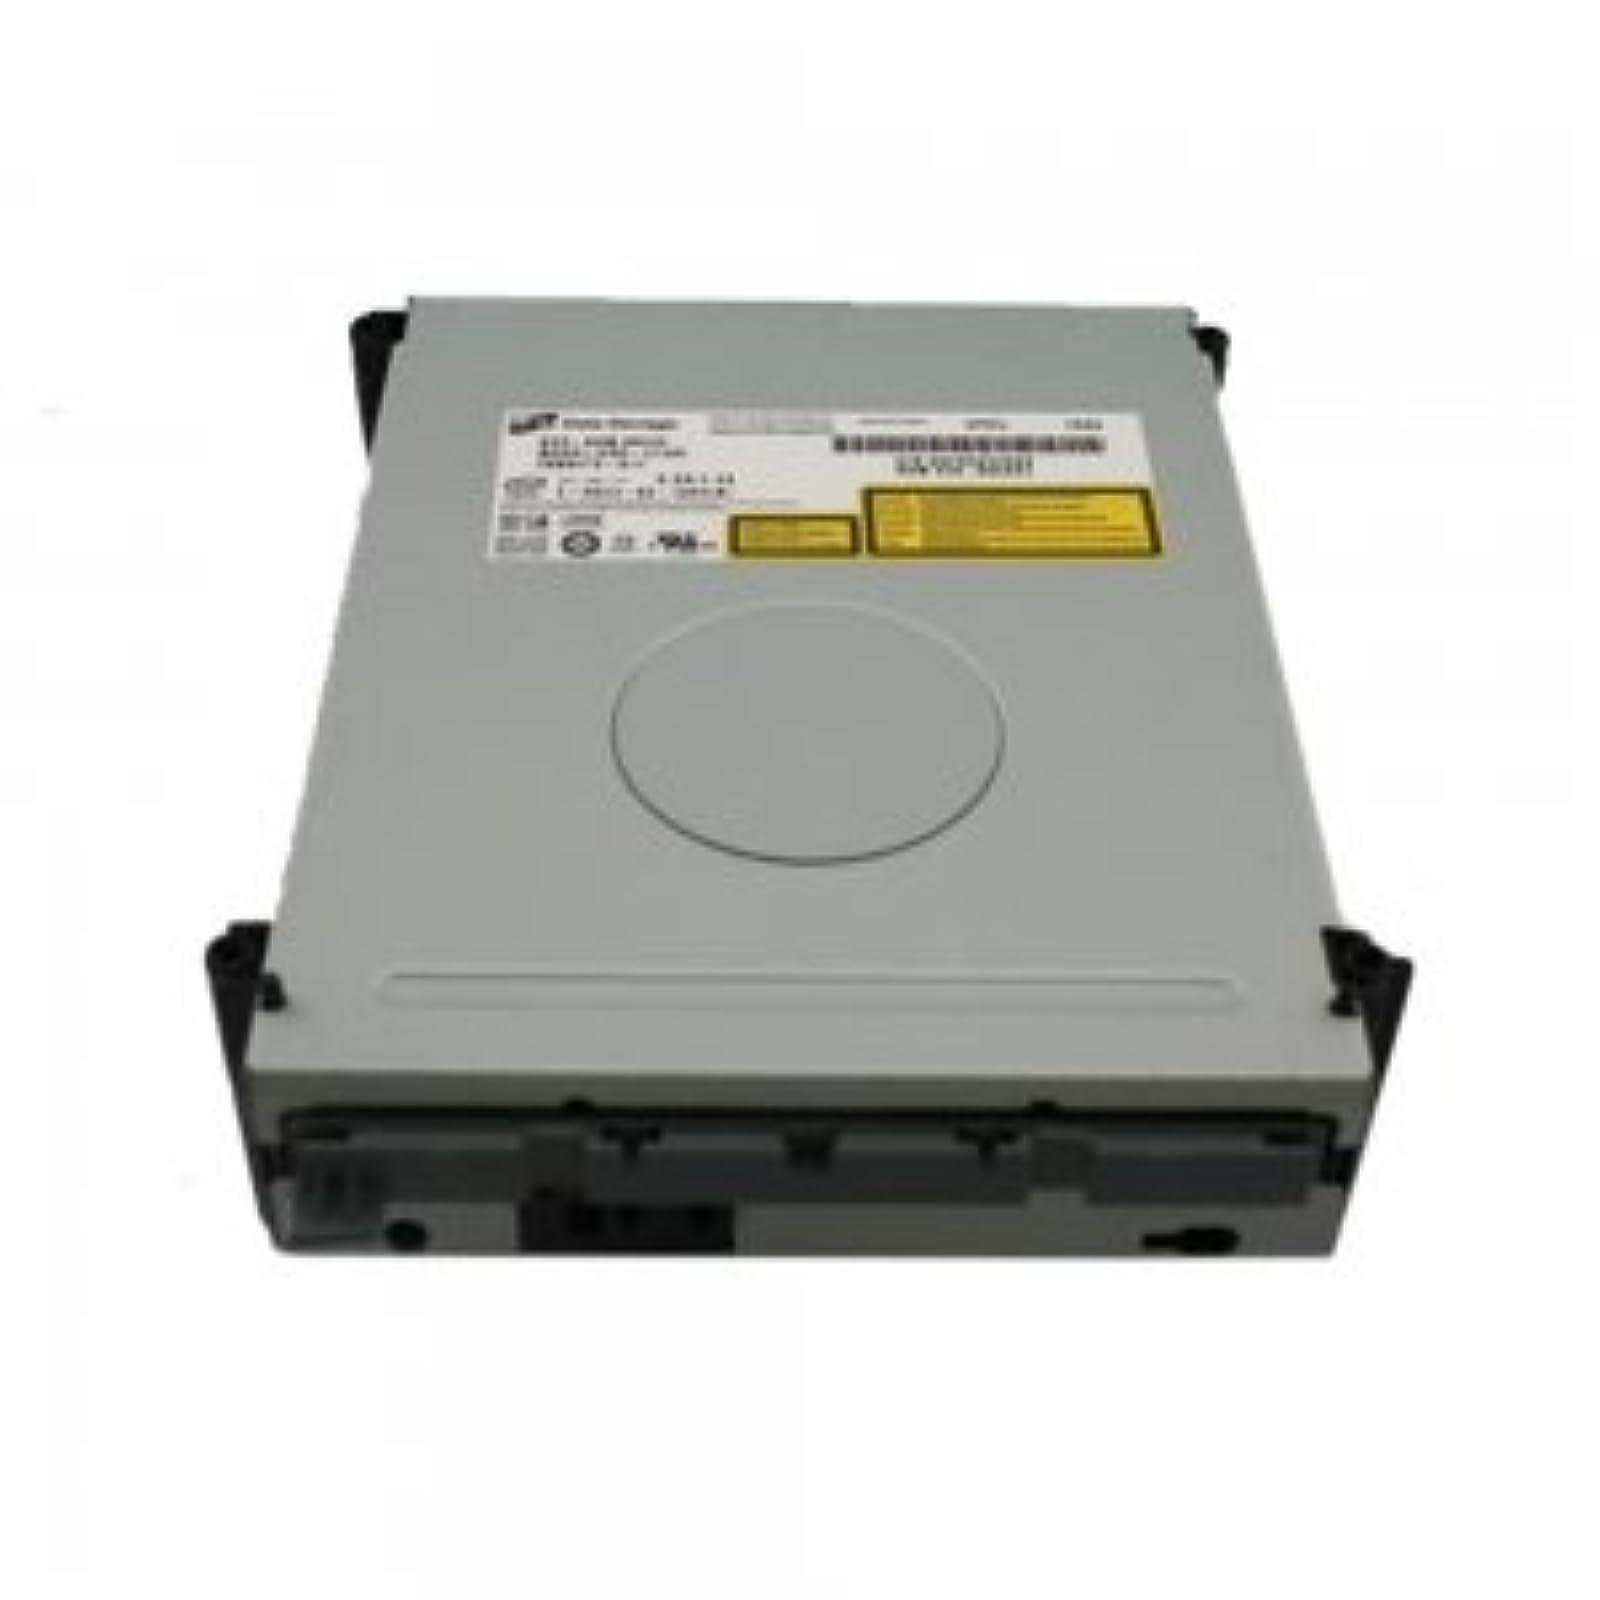 Xbox 360 Hitachi-Lg 59DJ GDR-3120L DVD Driver